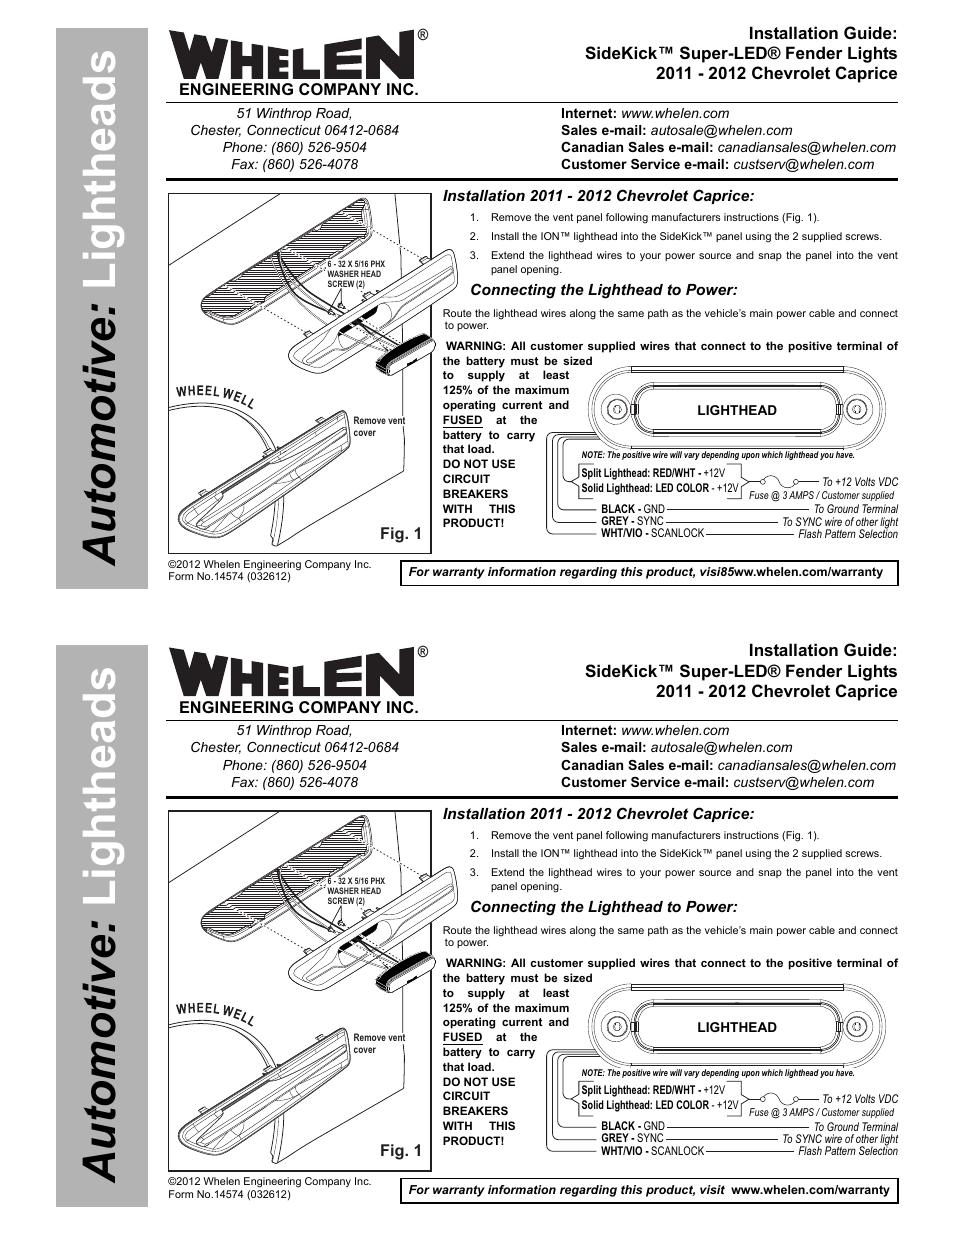 [DIAGRAM] Ipod Sync 3 Wiring Diagram FULL Version HD